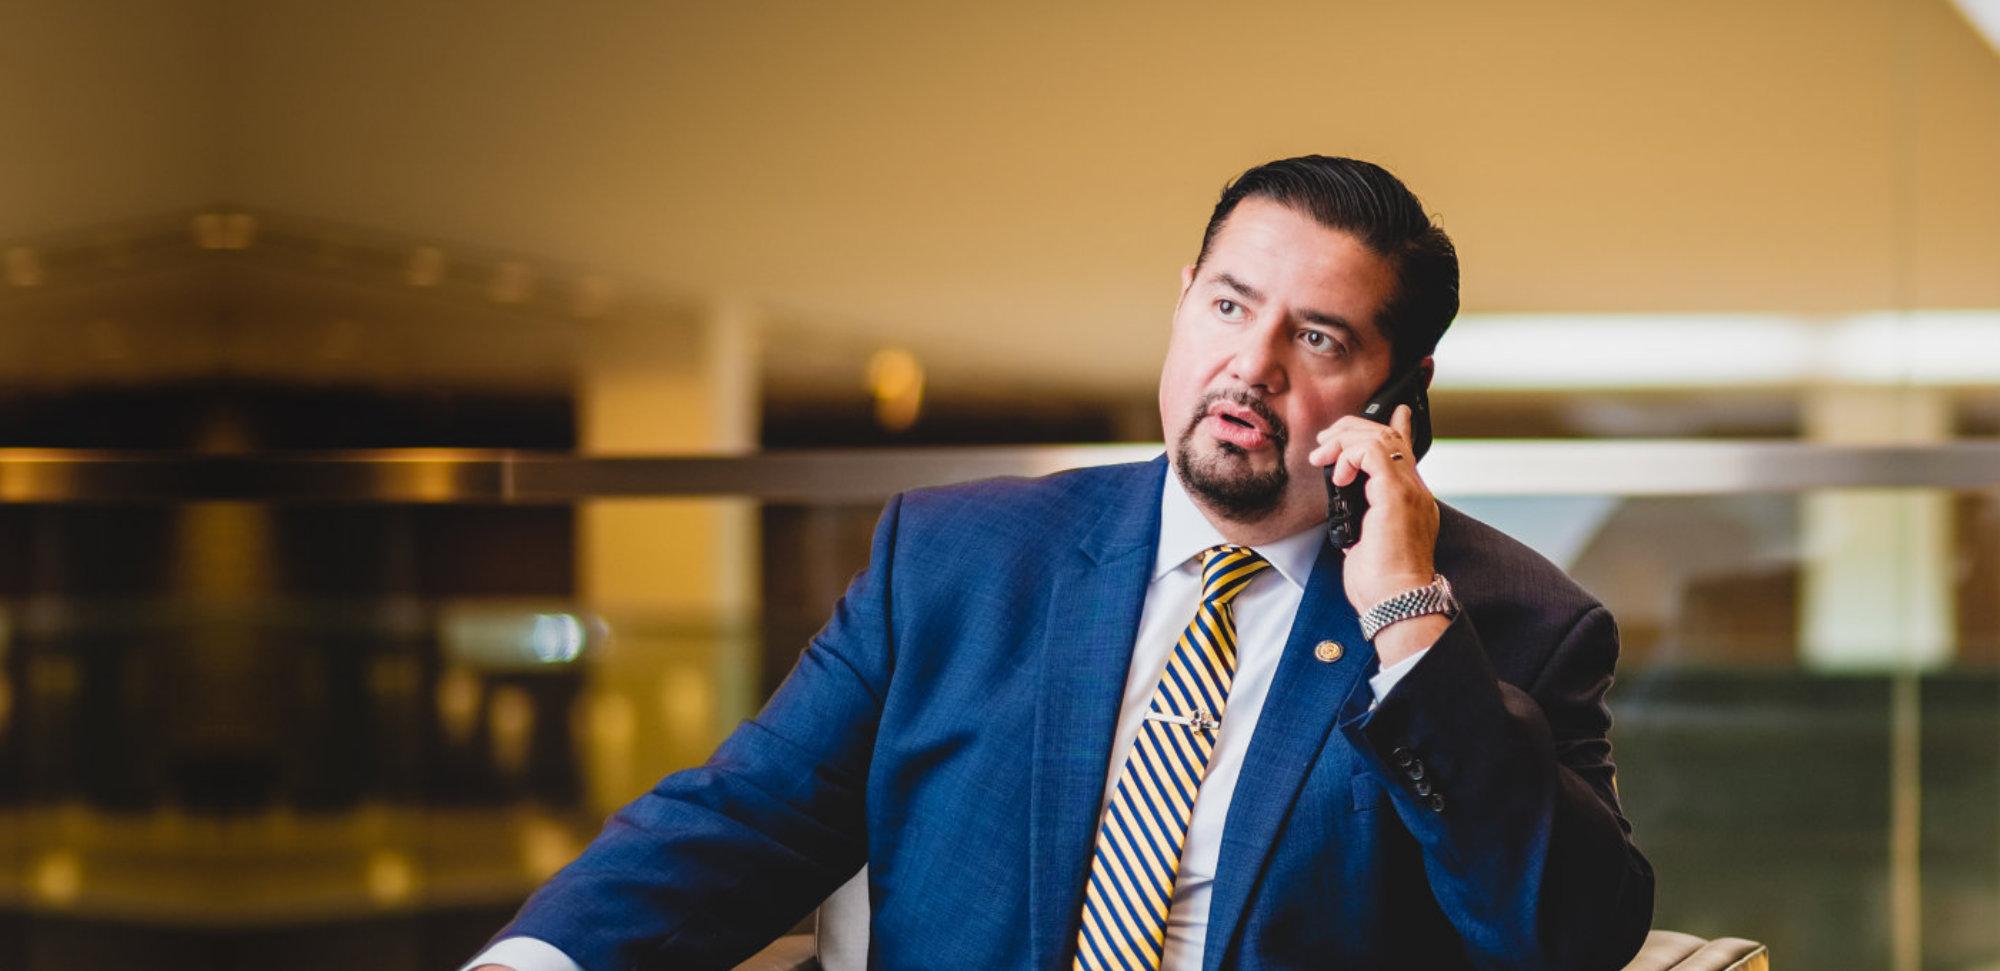 Attorney Joe Flores calling someone